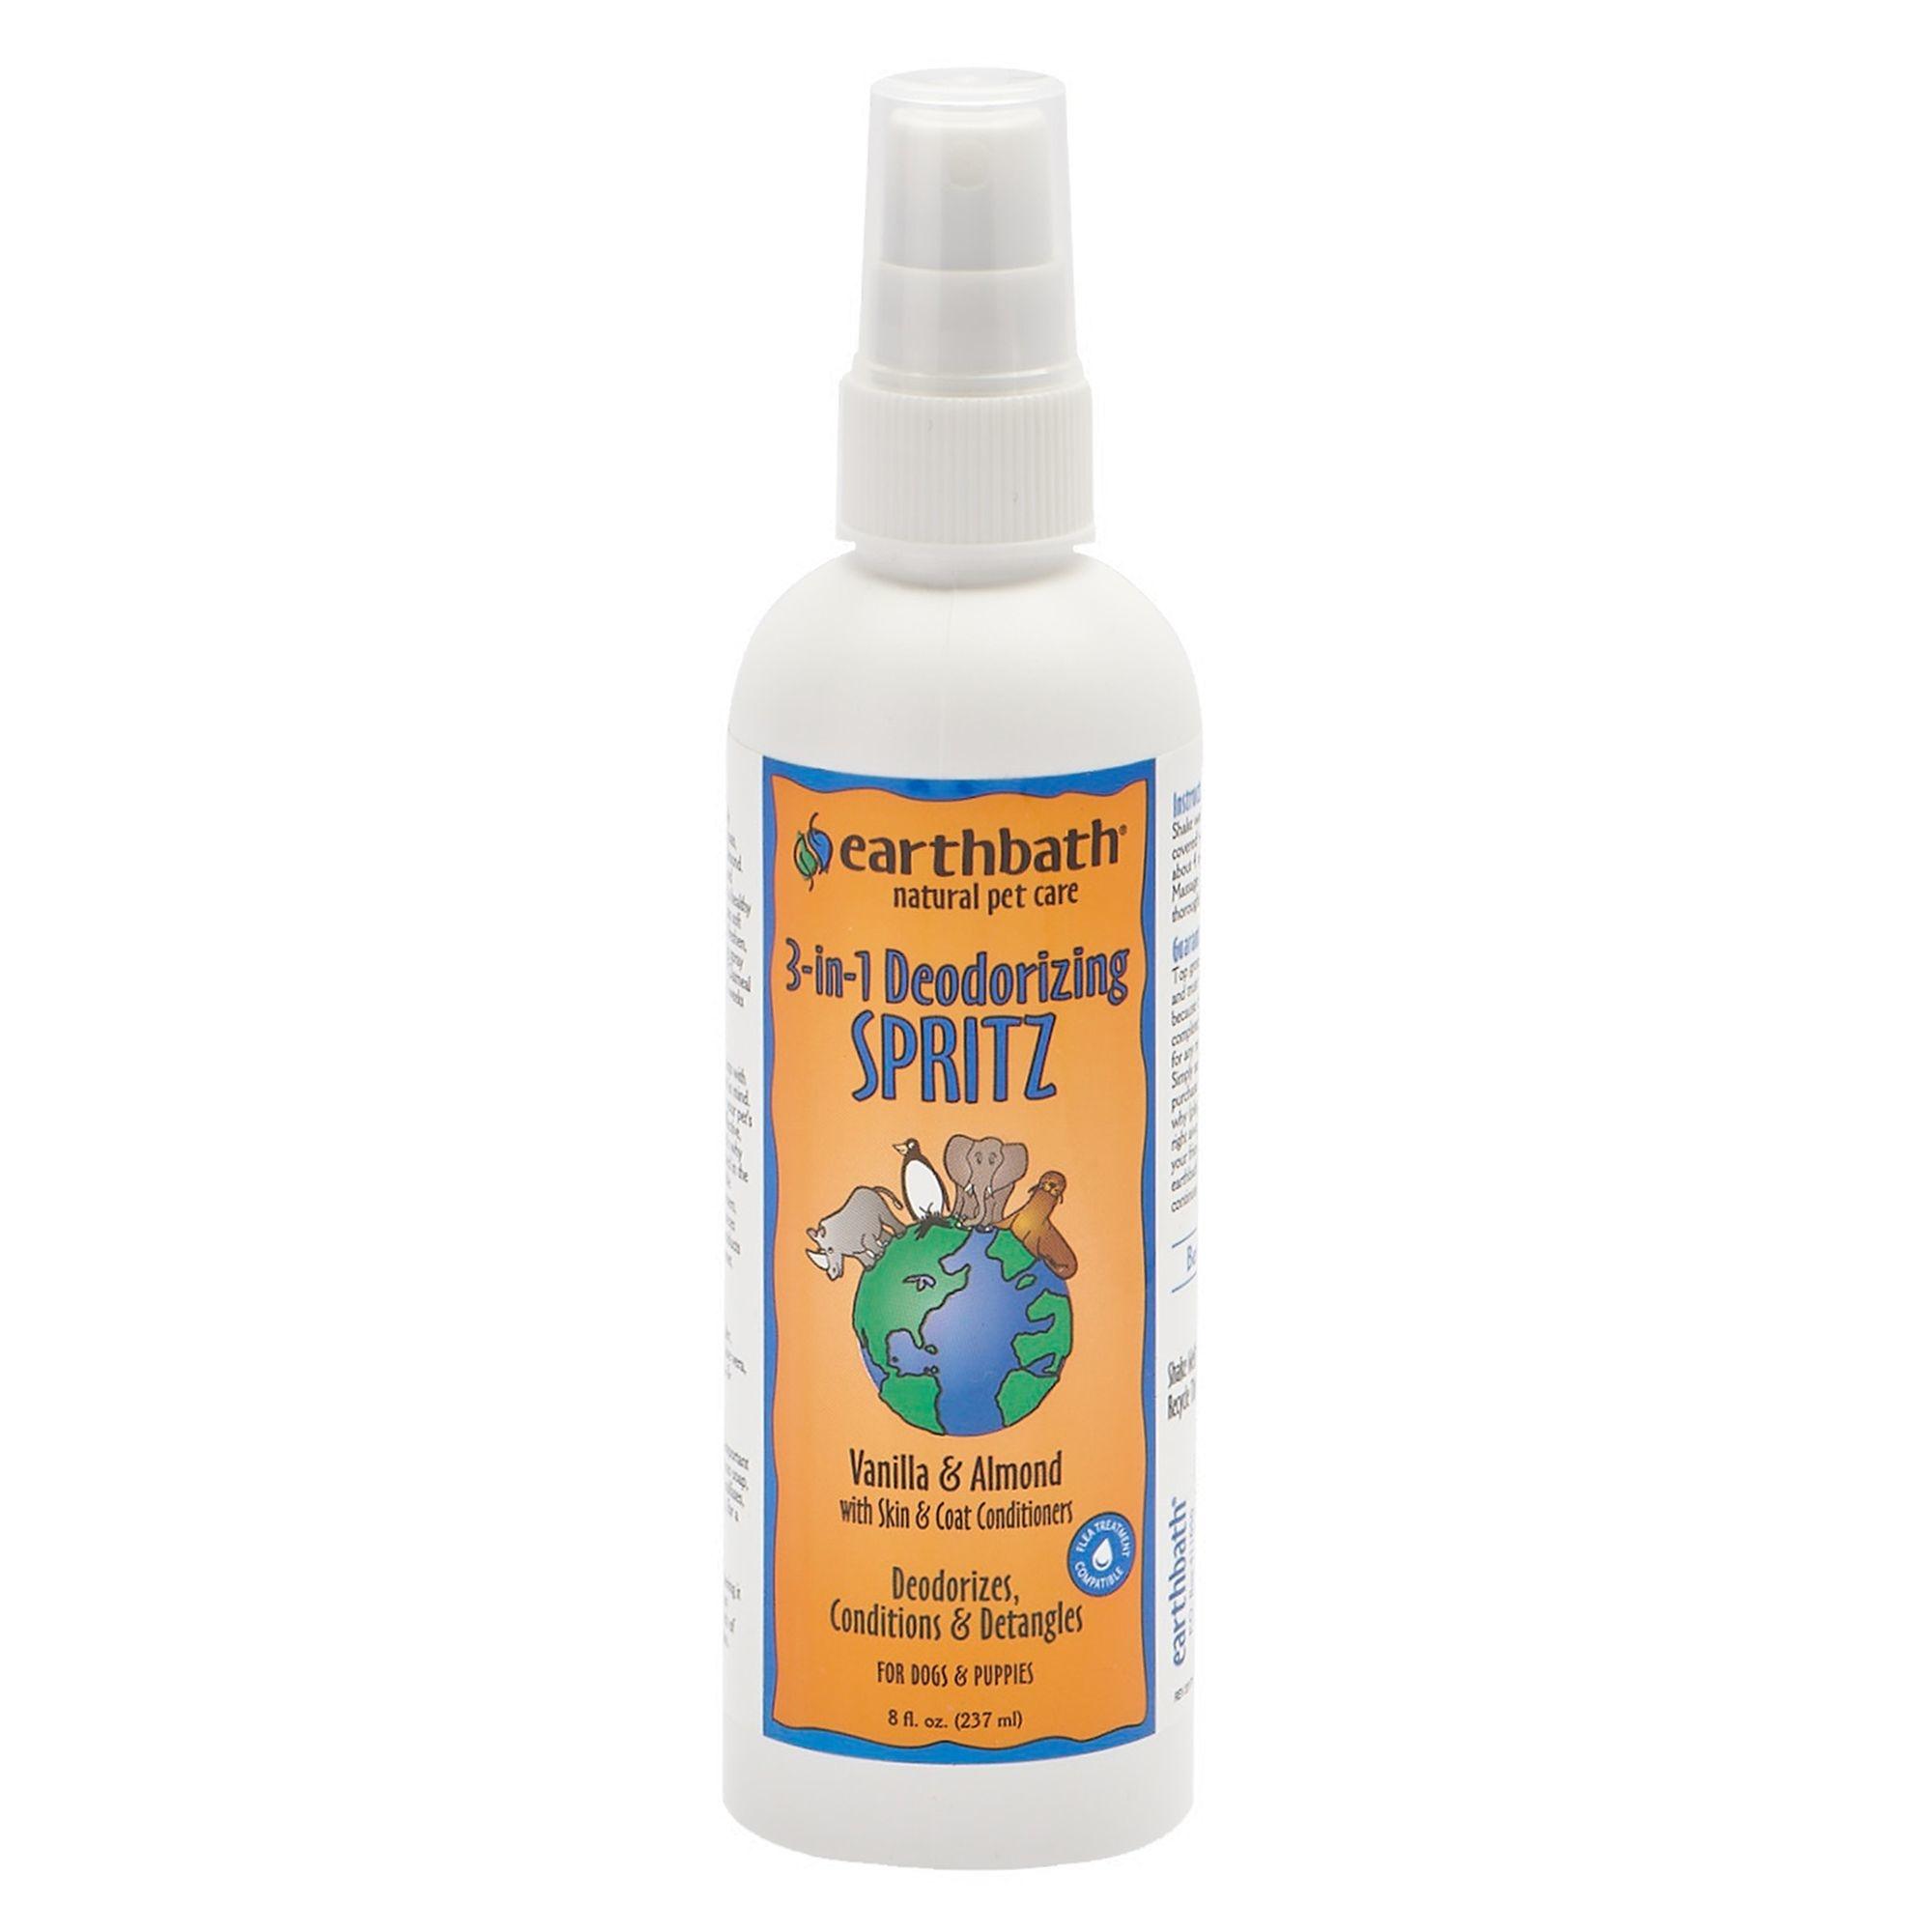 Earthbath Earthbath 3-in-1 Vanilla & Almond Deodorizing Spritz 8oz